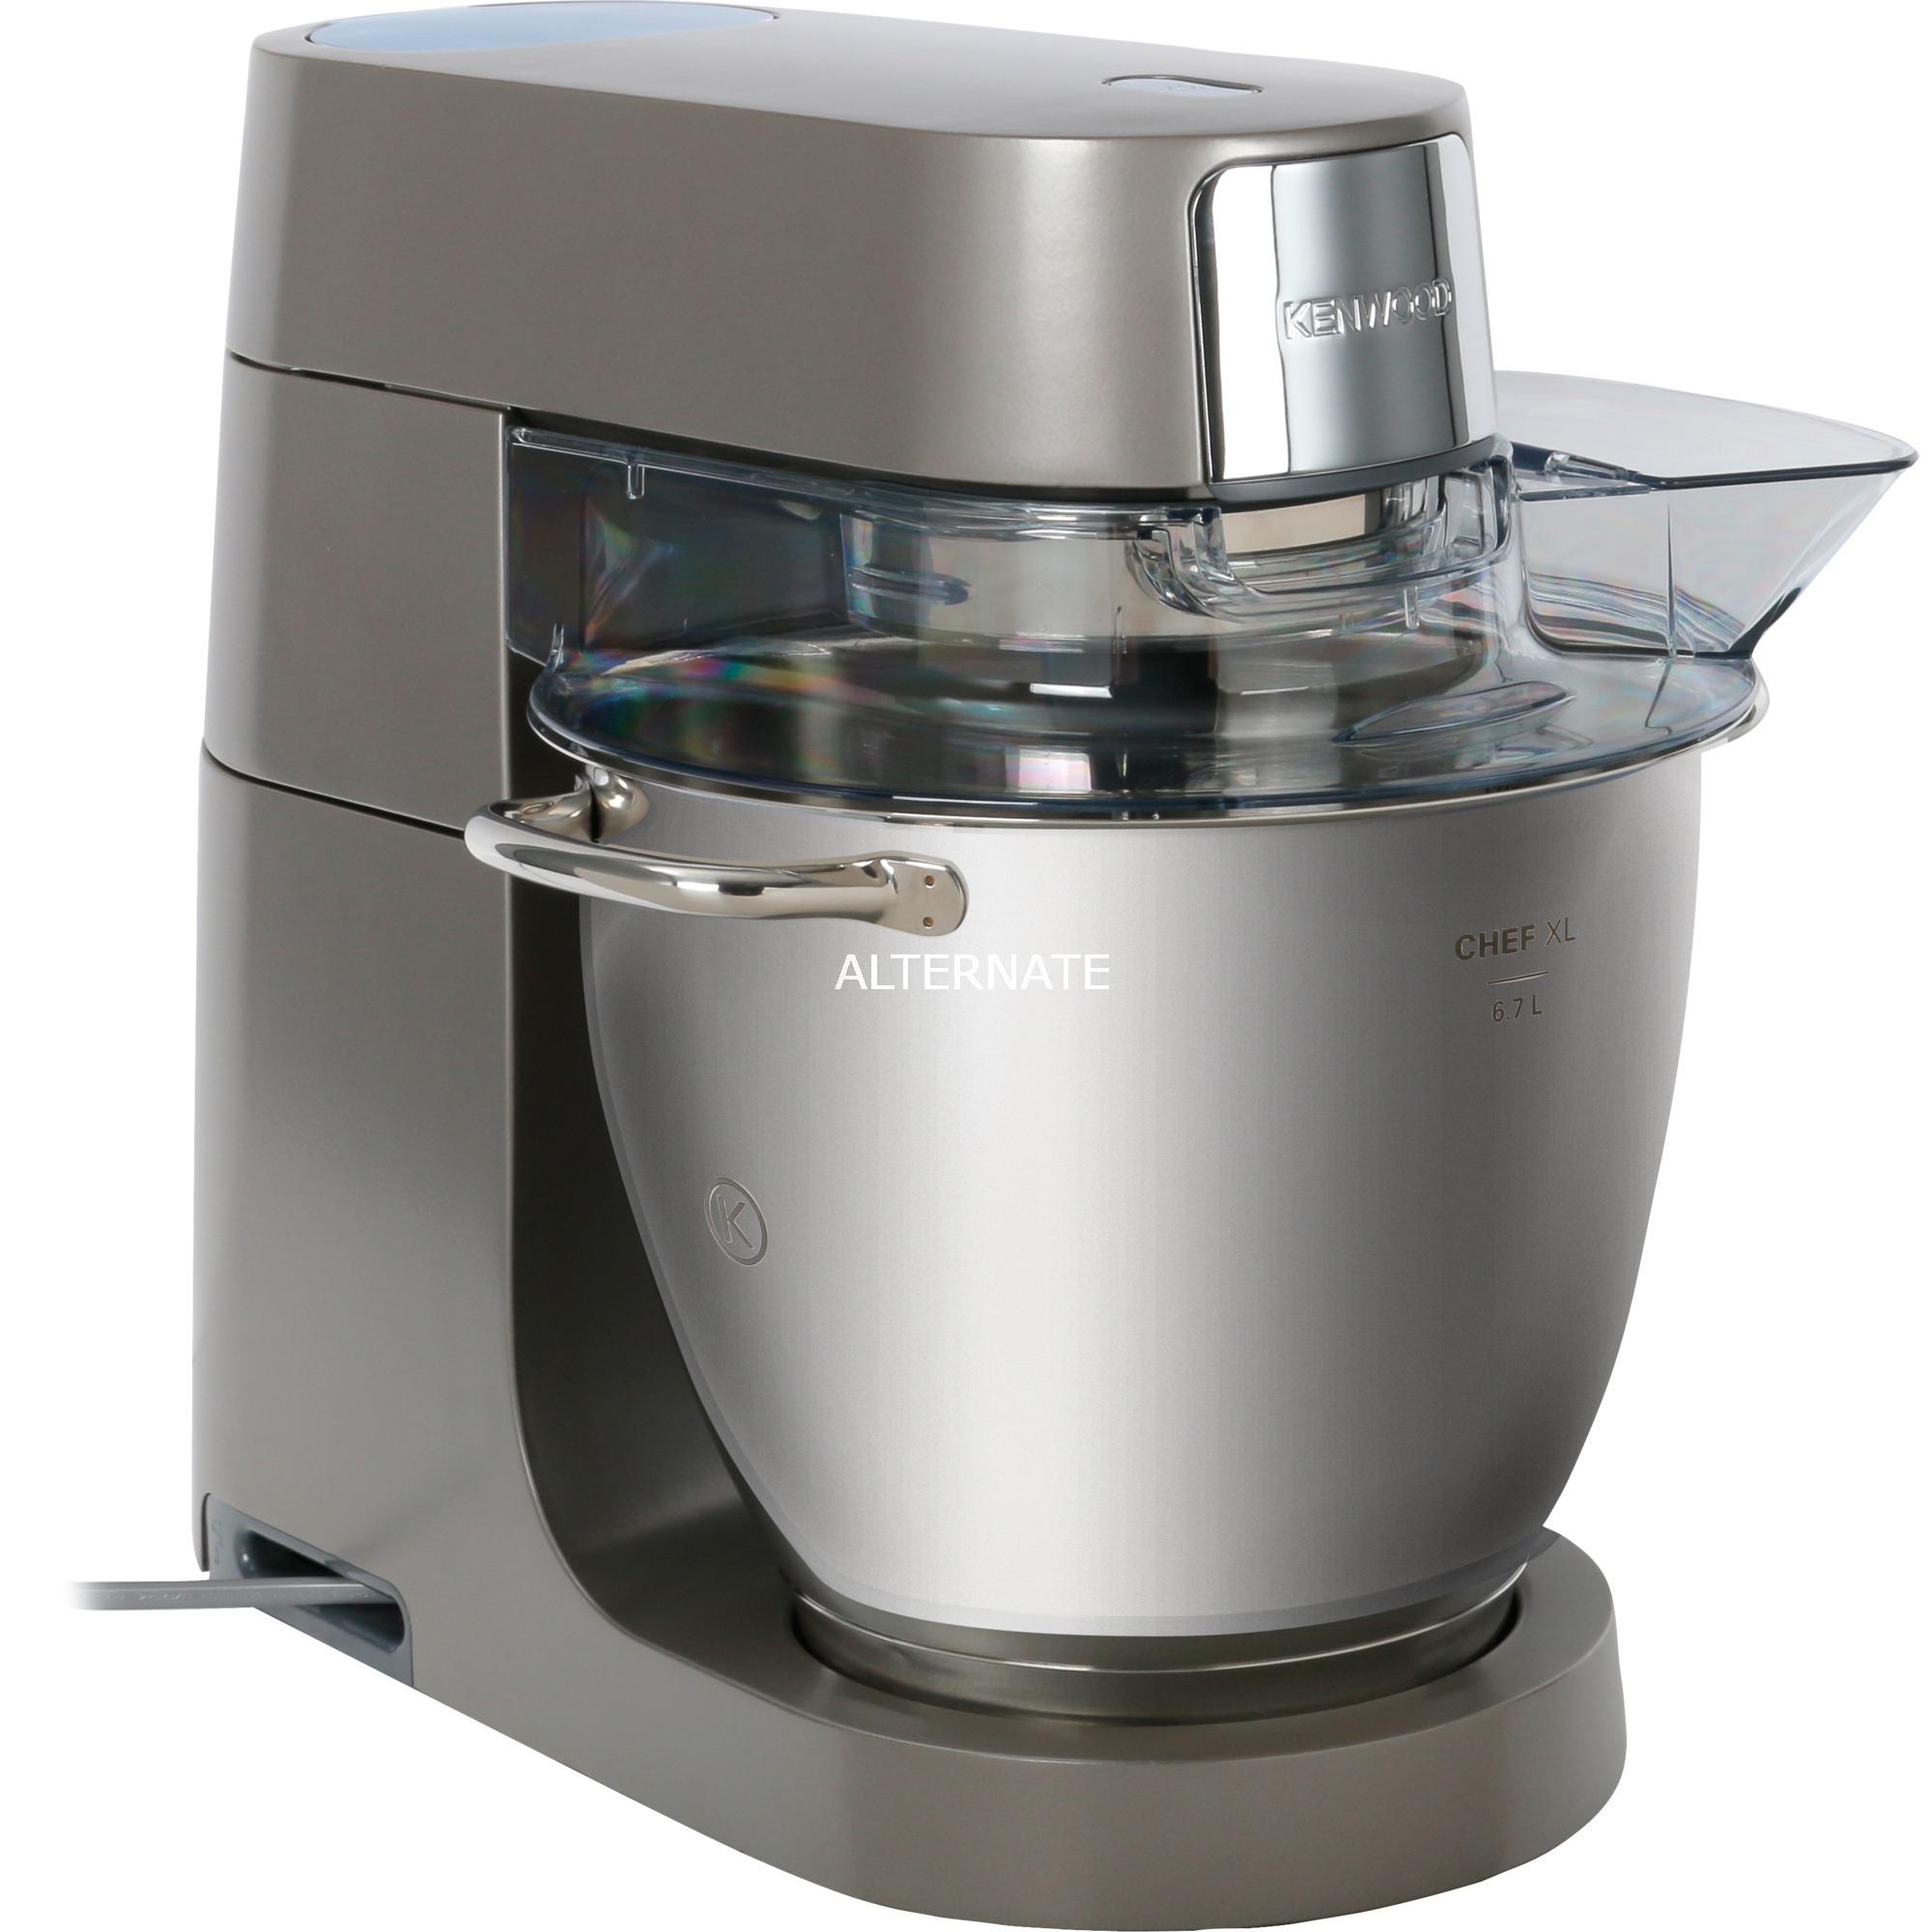 Chef XL KVL4110S Batidora de varillas 1200W Plata, Robot de cocina